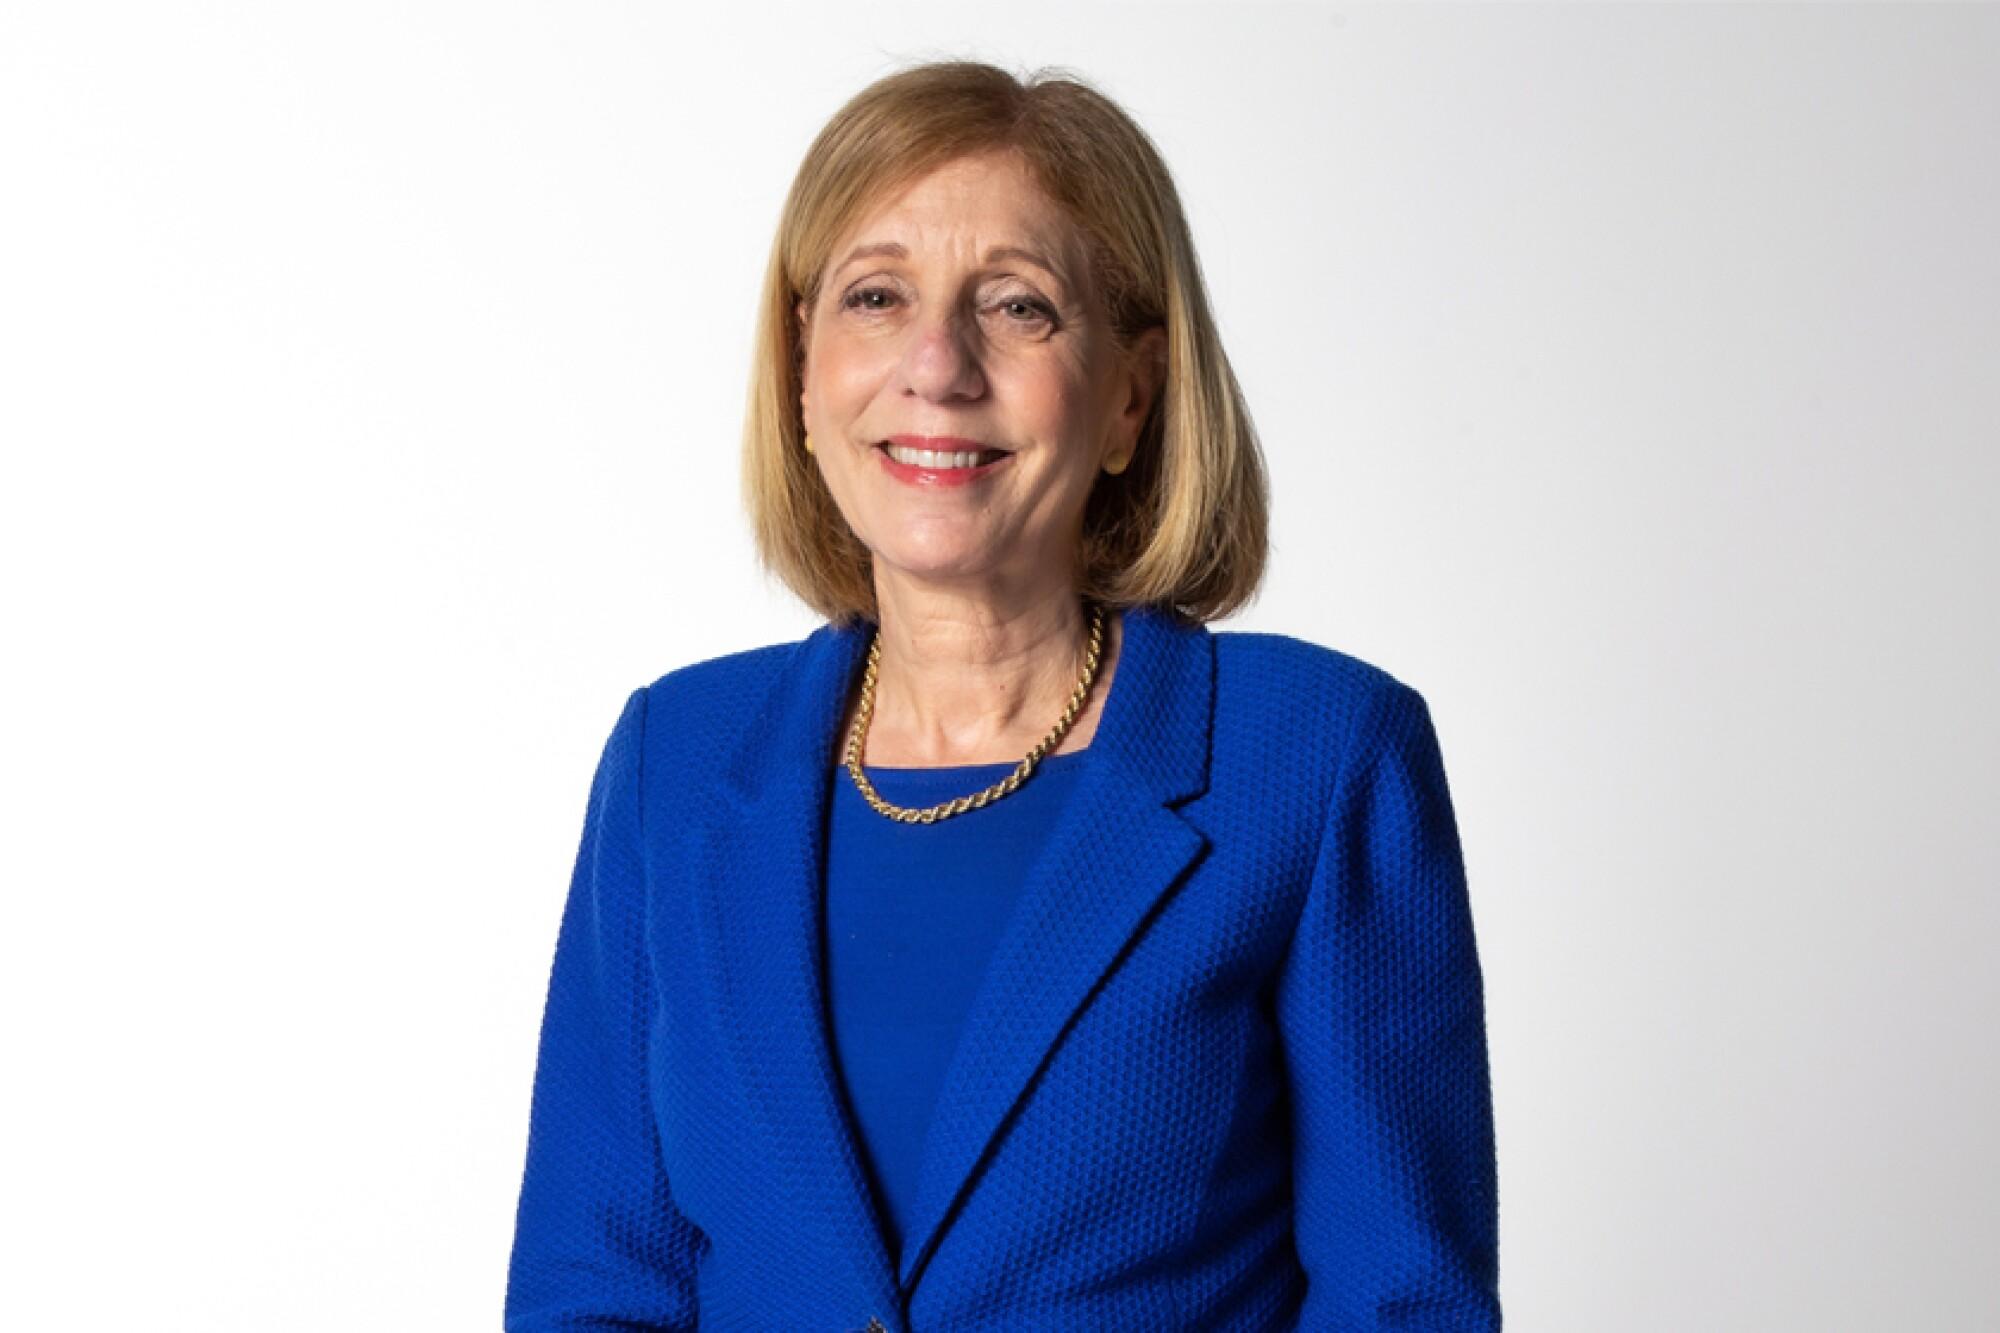 Barbara Bry, candidate for San Diego mayor.